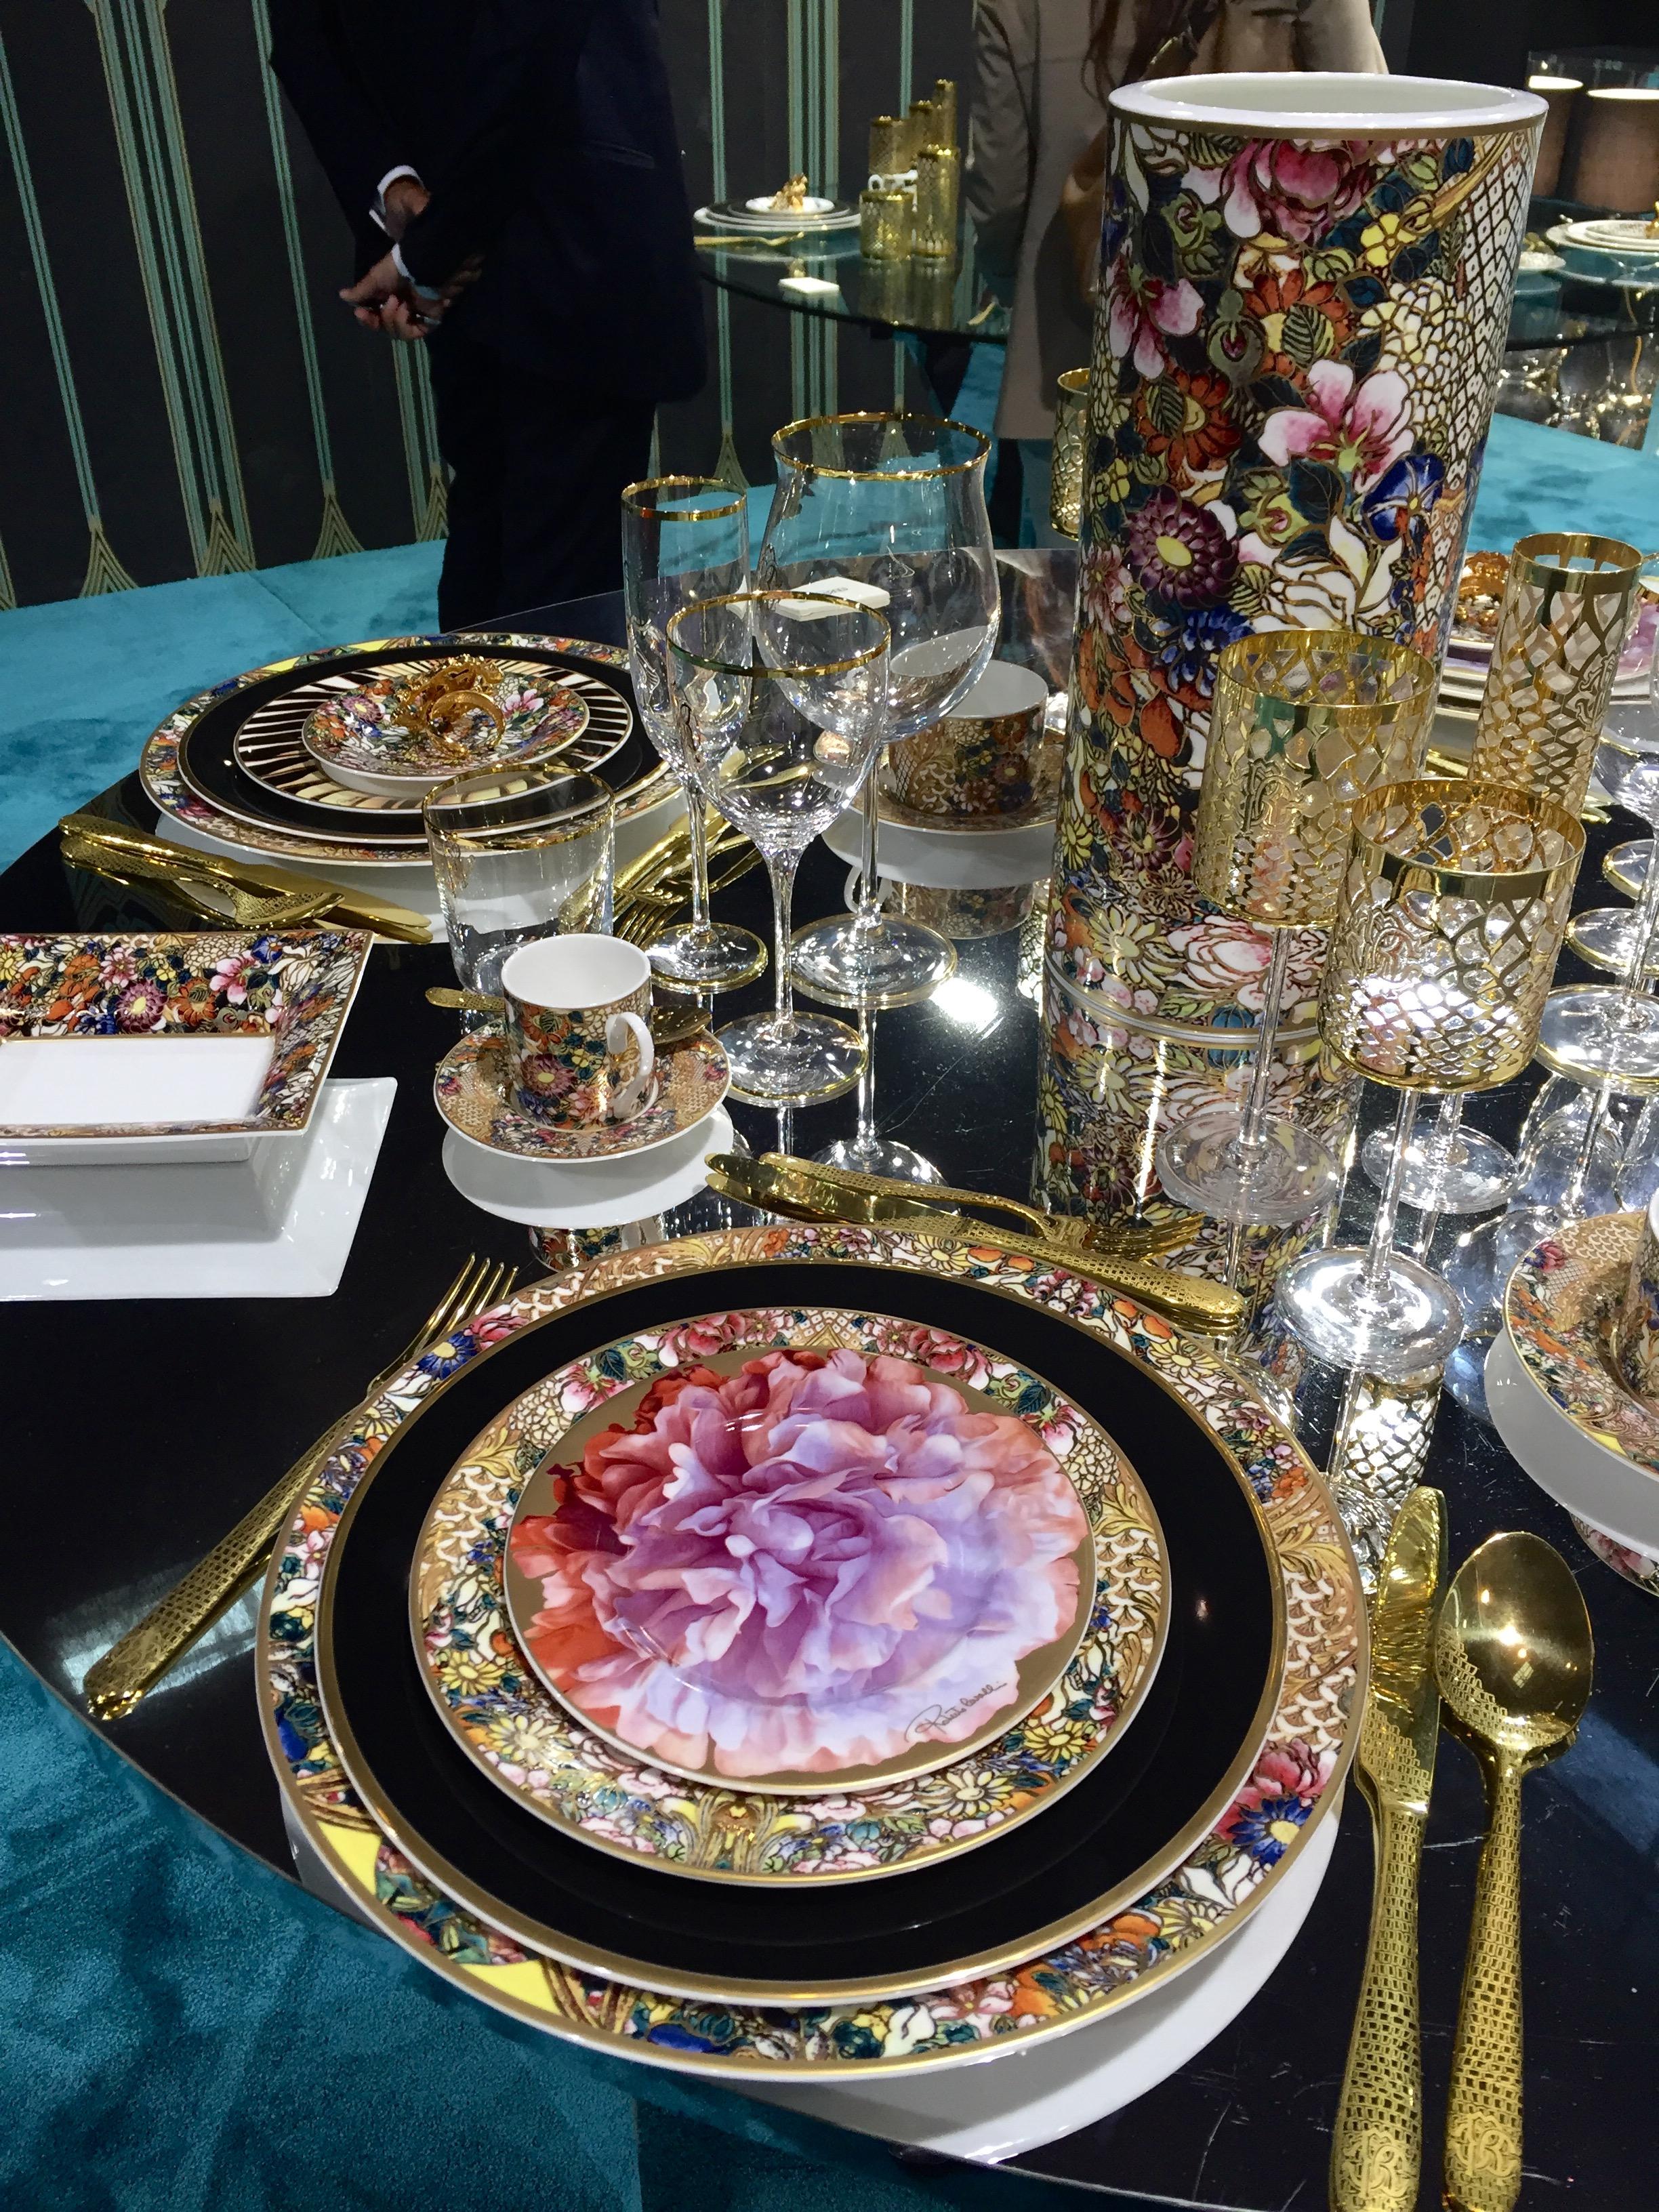 Maison&Objet 2016 September edition - Roberto Cavalli luxury tableware | Masha Shapiro Agency.jpg